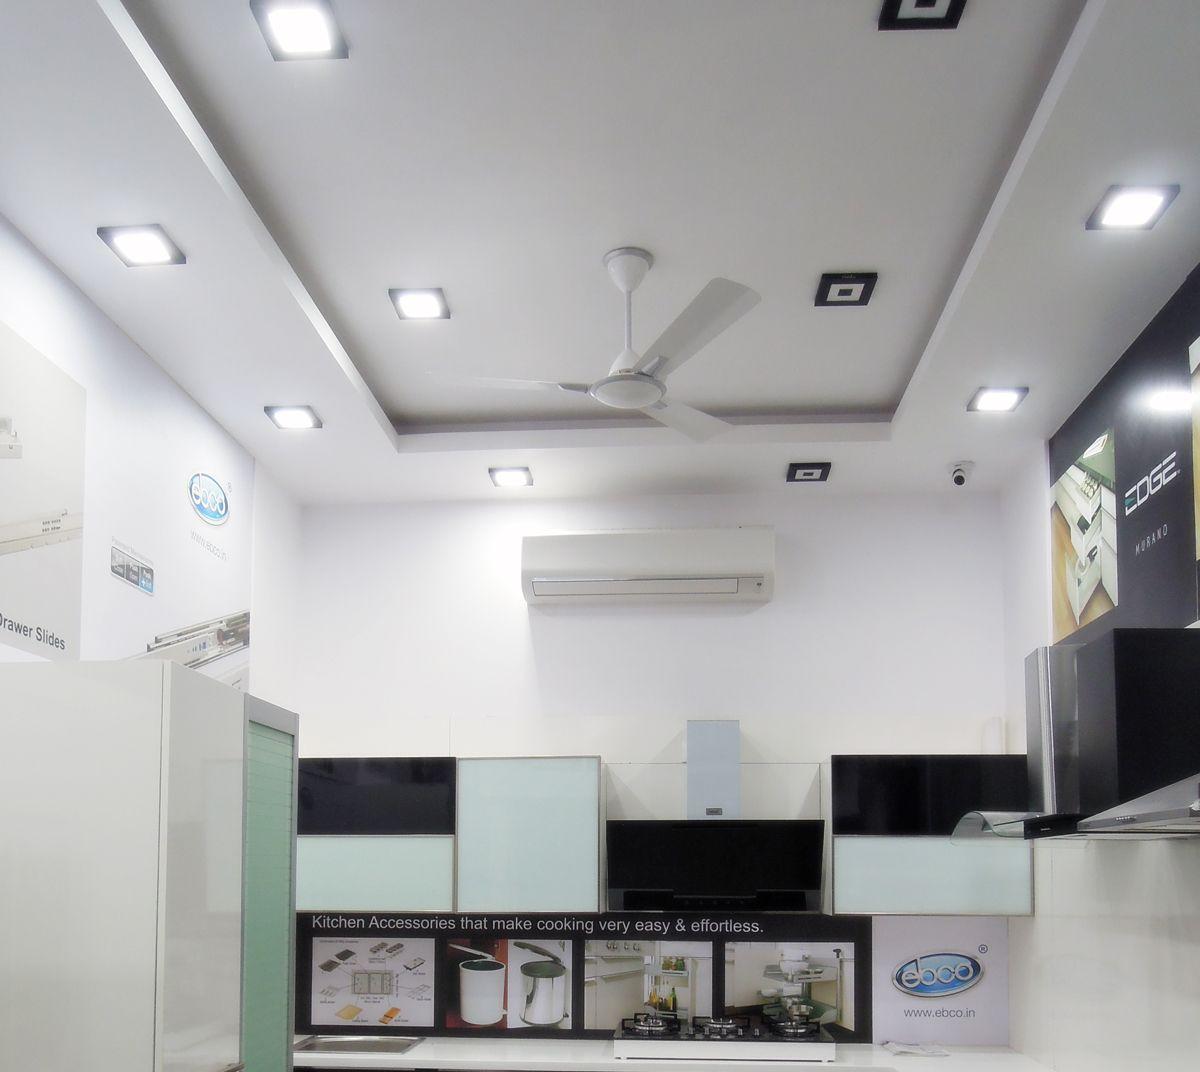 False Ceiling Led Lights Size : W led recessed light for false ceiling ideas the